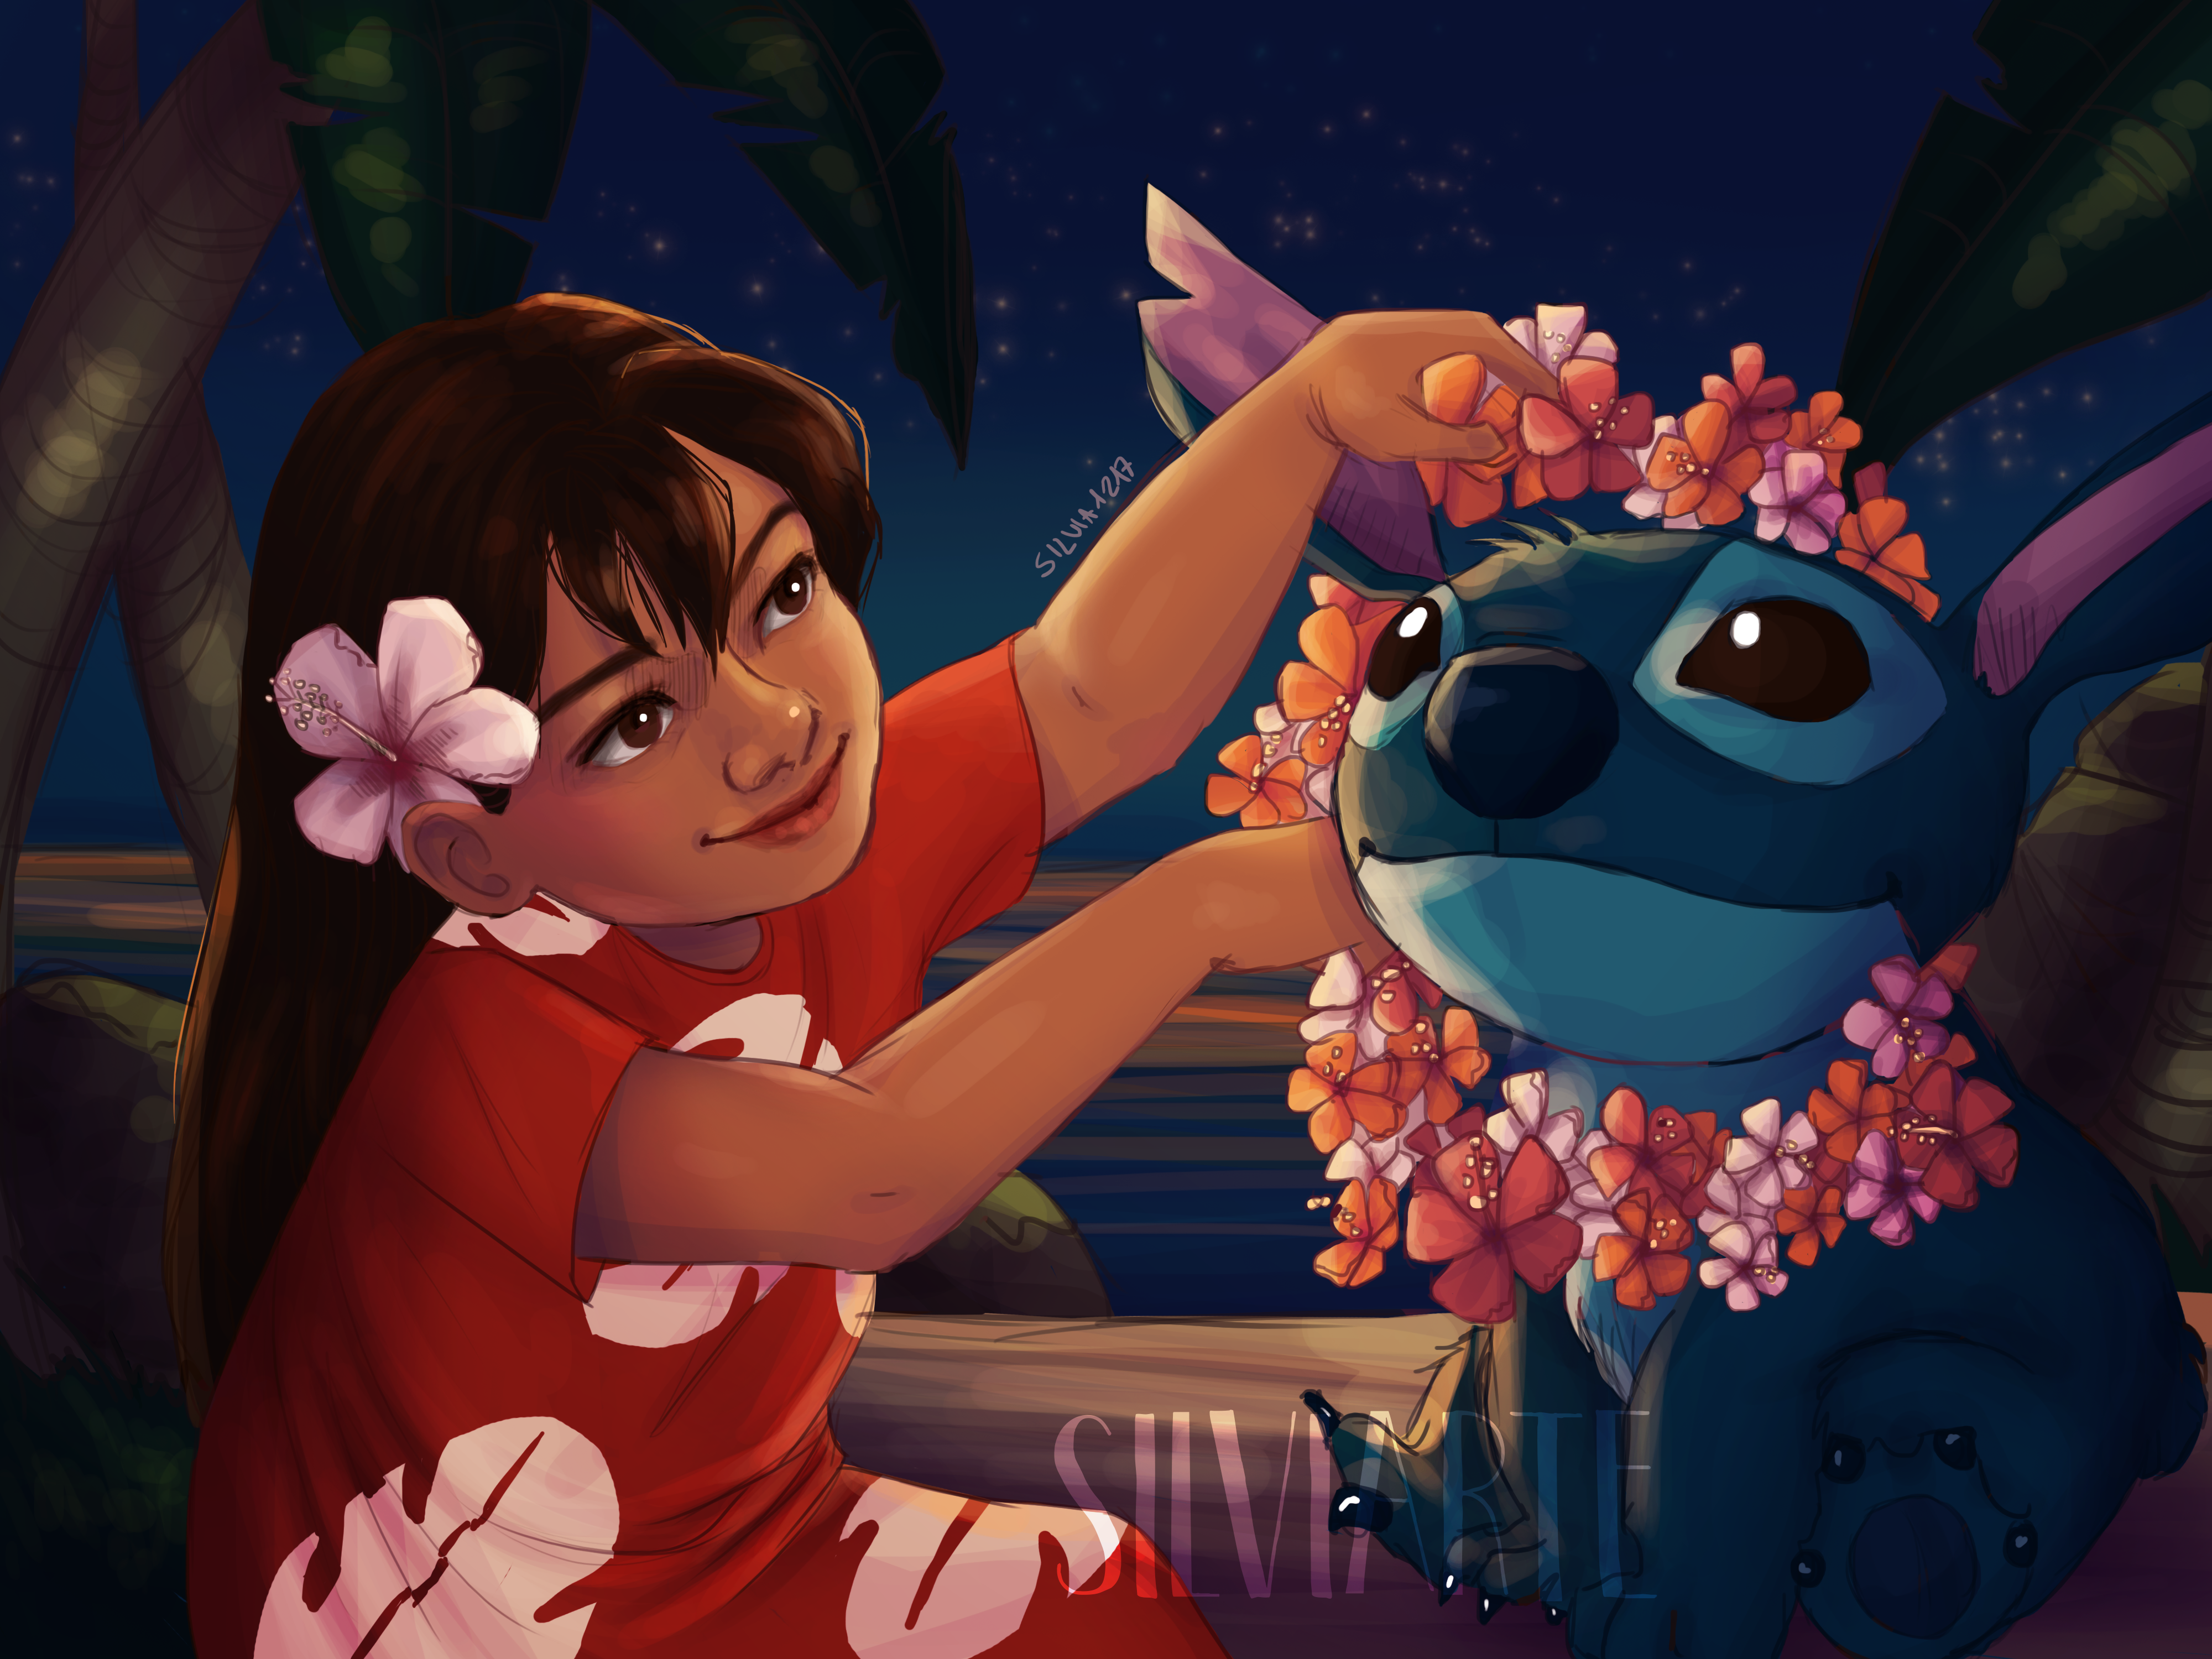 Lilo and Stitch fanart #1 by Silviarte by silviarts